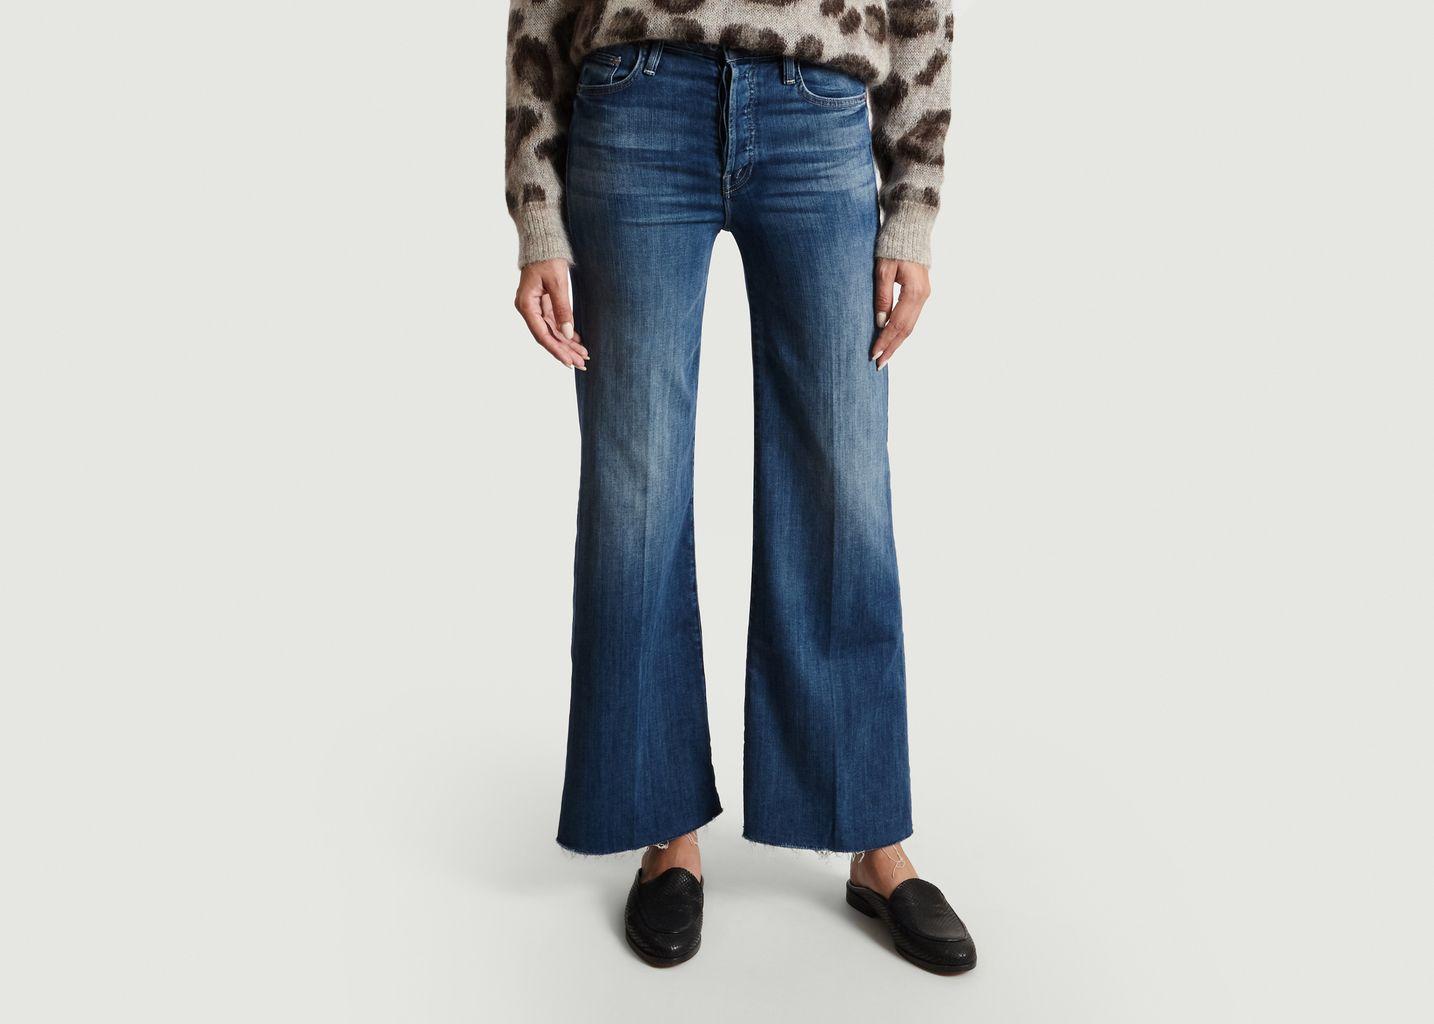 Jeans Tomcat Roller - Mother